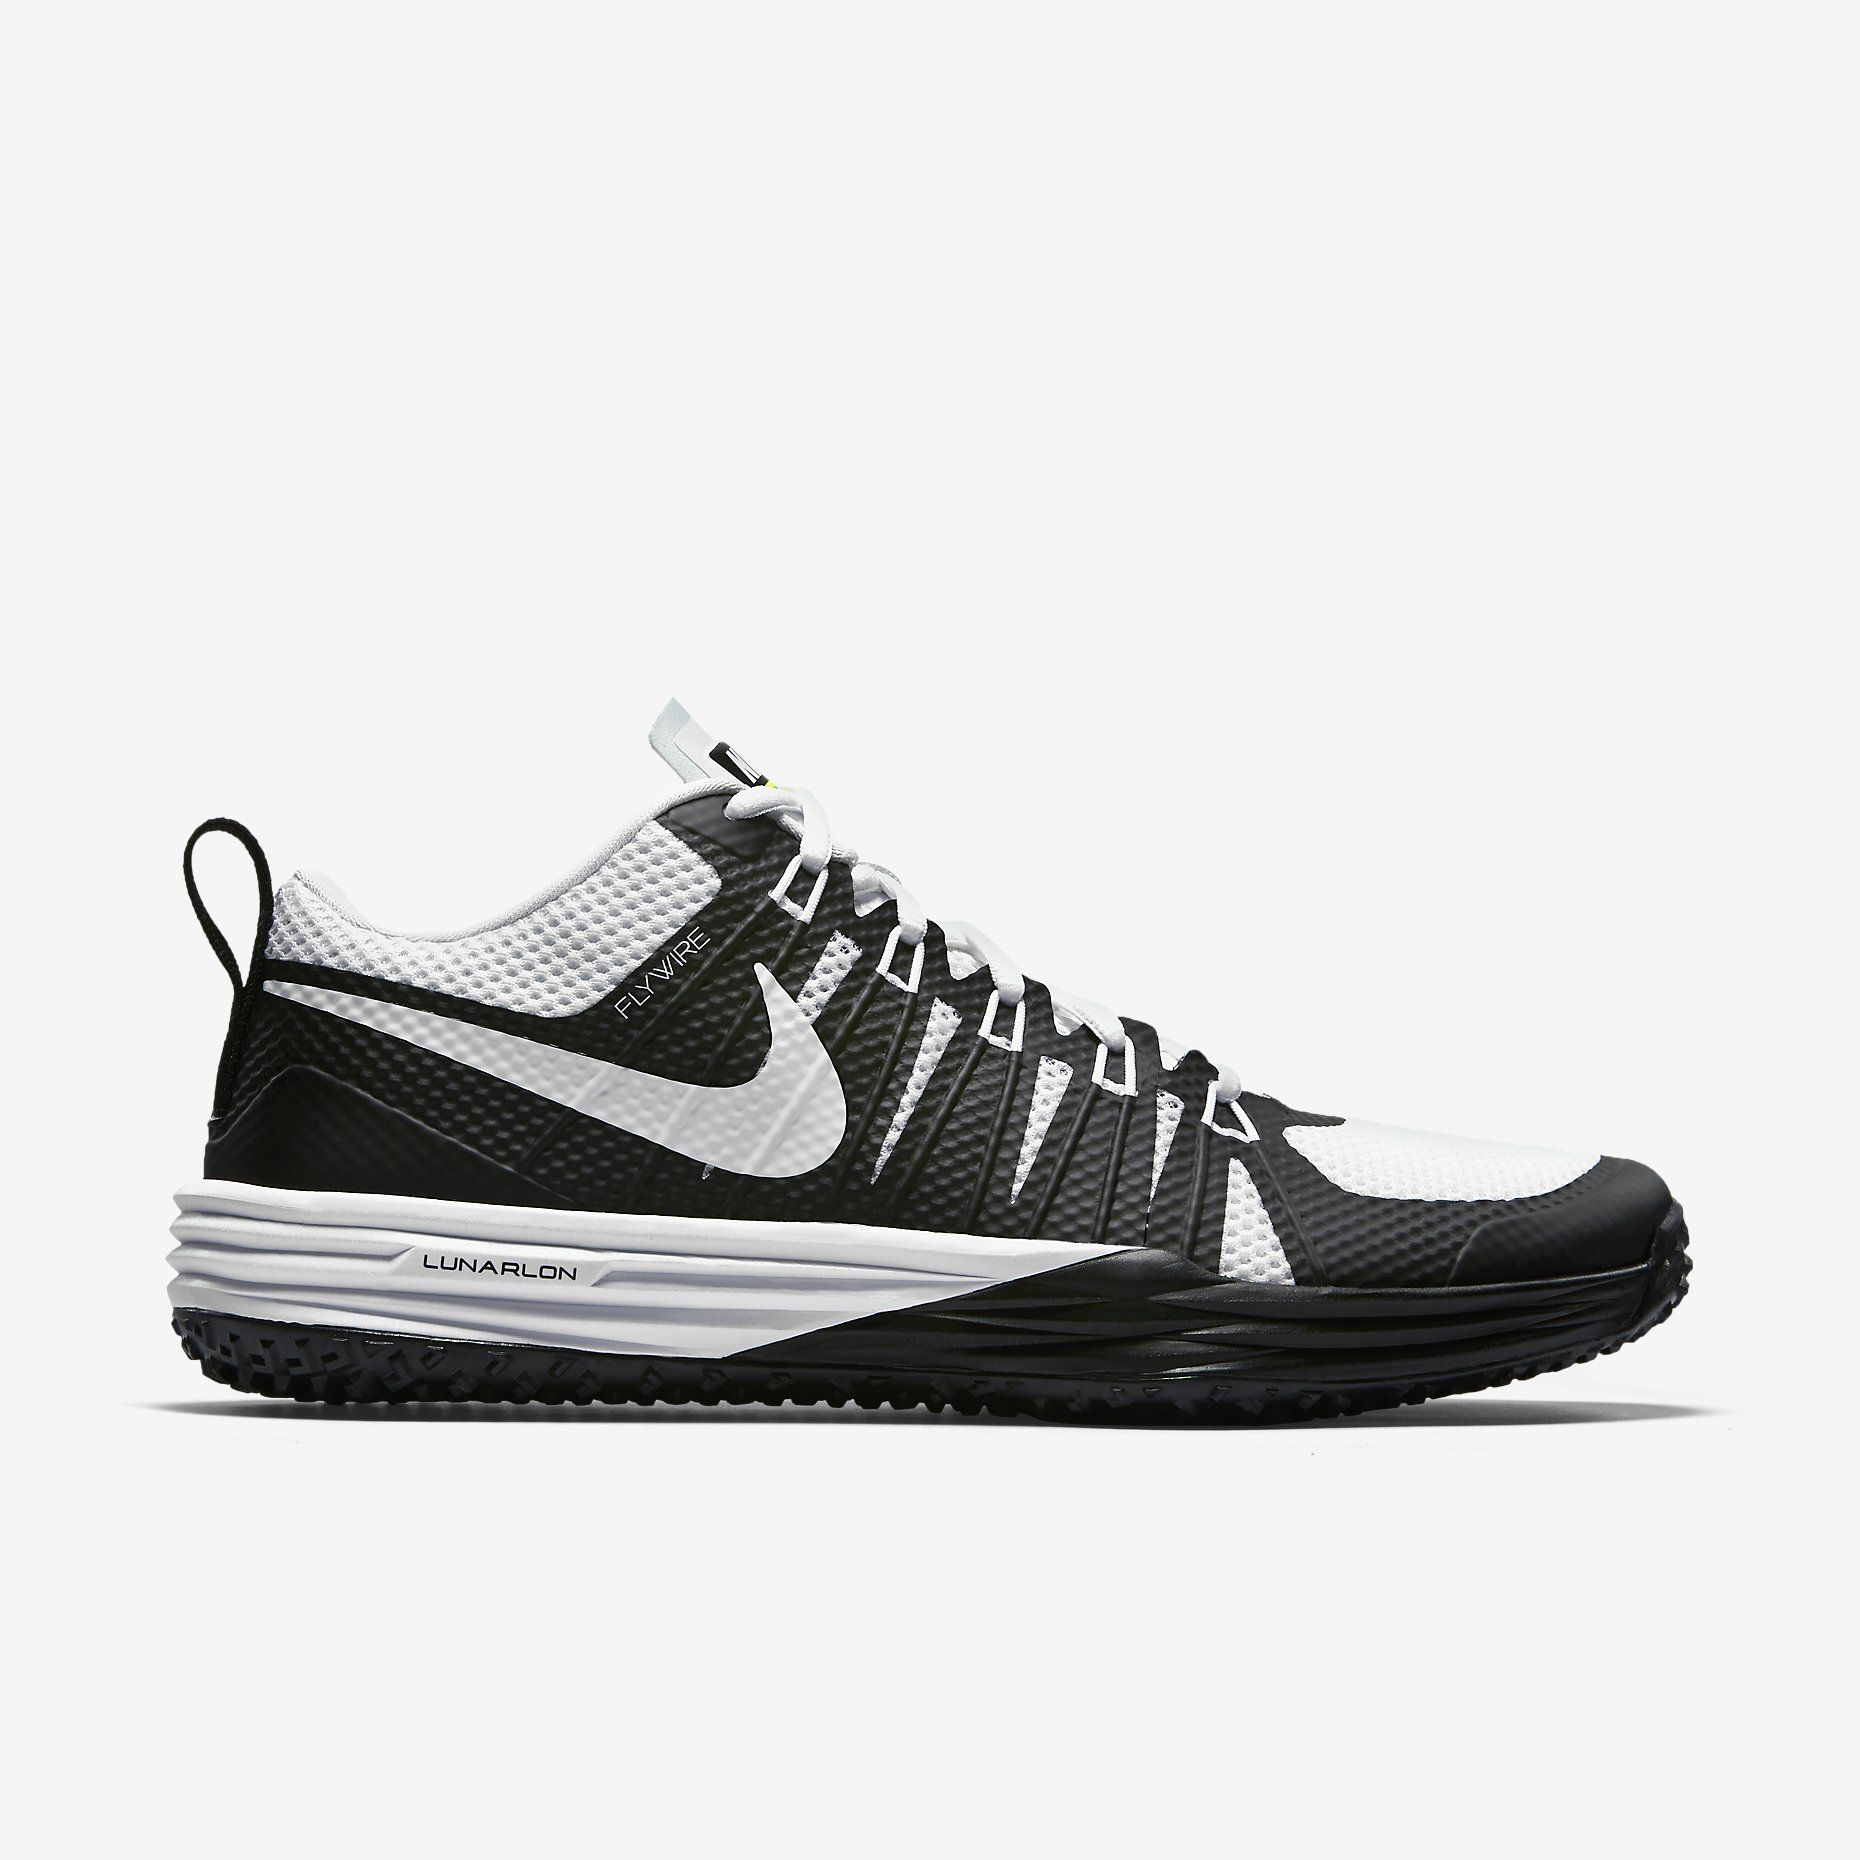 Nike Lunar Trainer 1 | Mens training